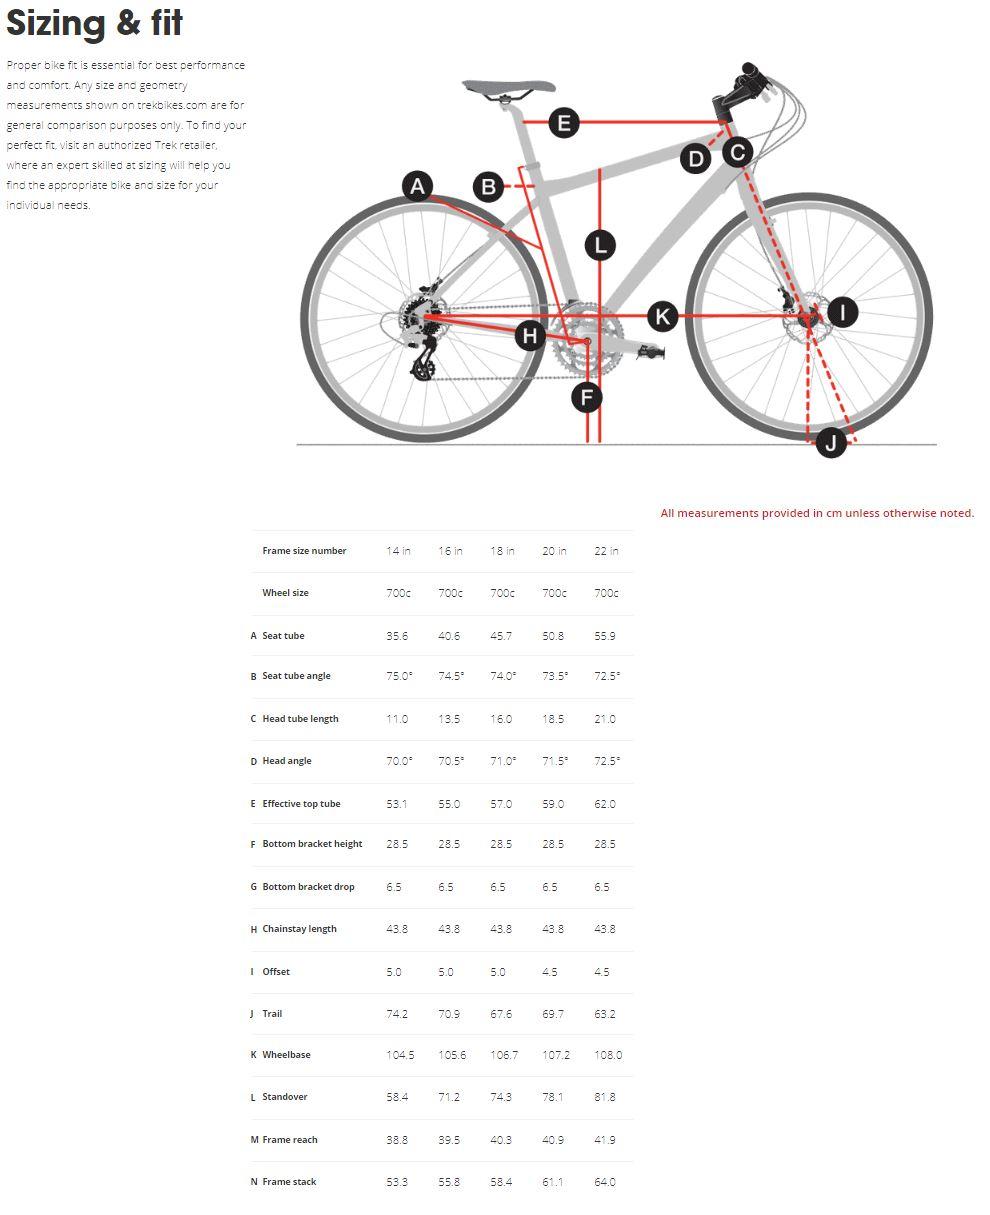 Trek FX S 5 geometry chart